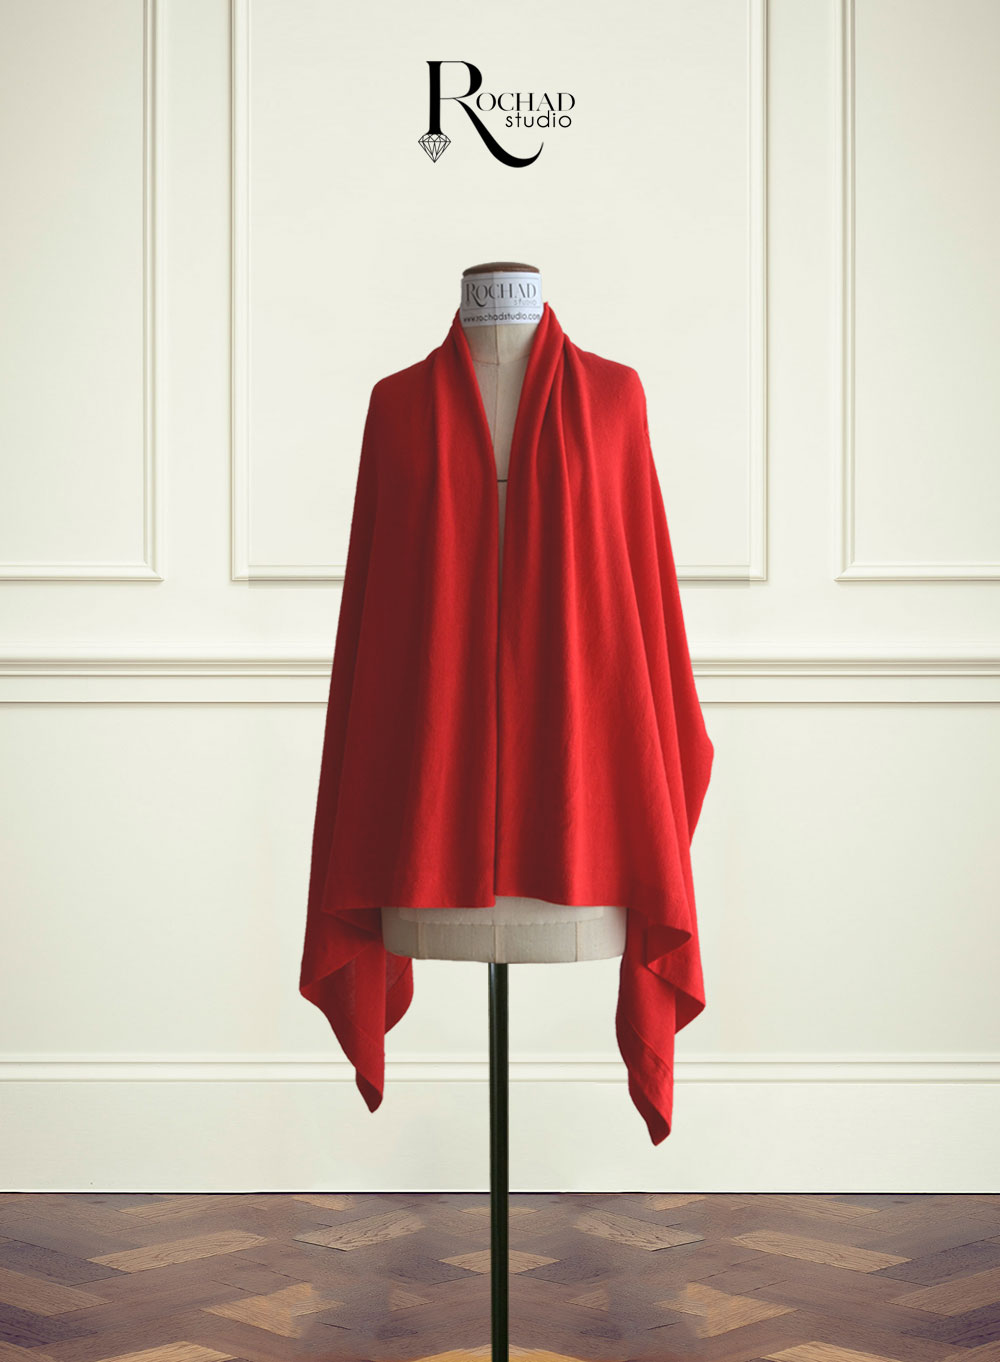 Rochad Studio // Madeleine cardi sewing pattern